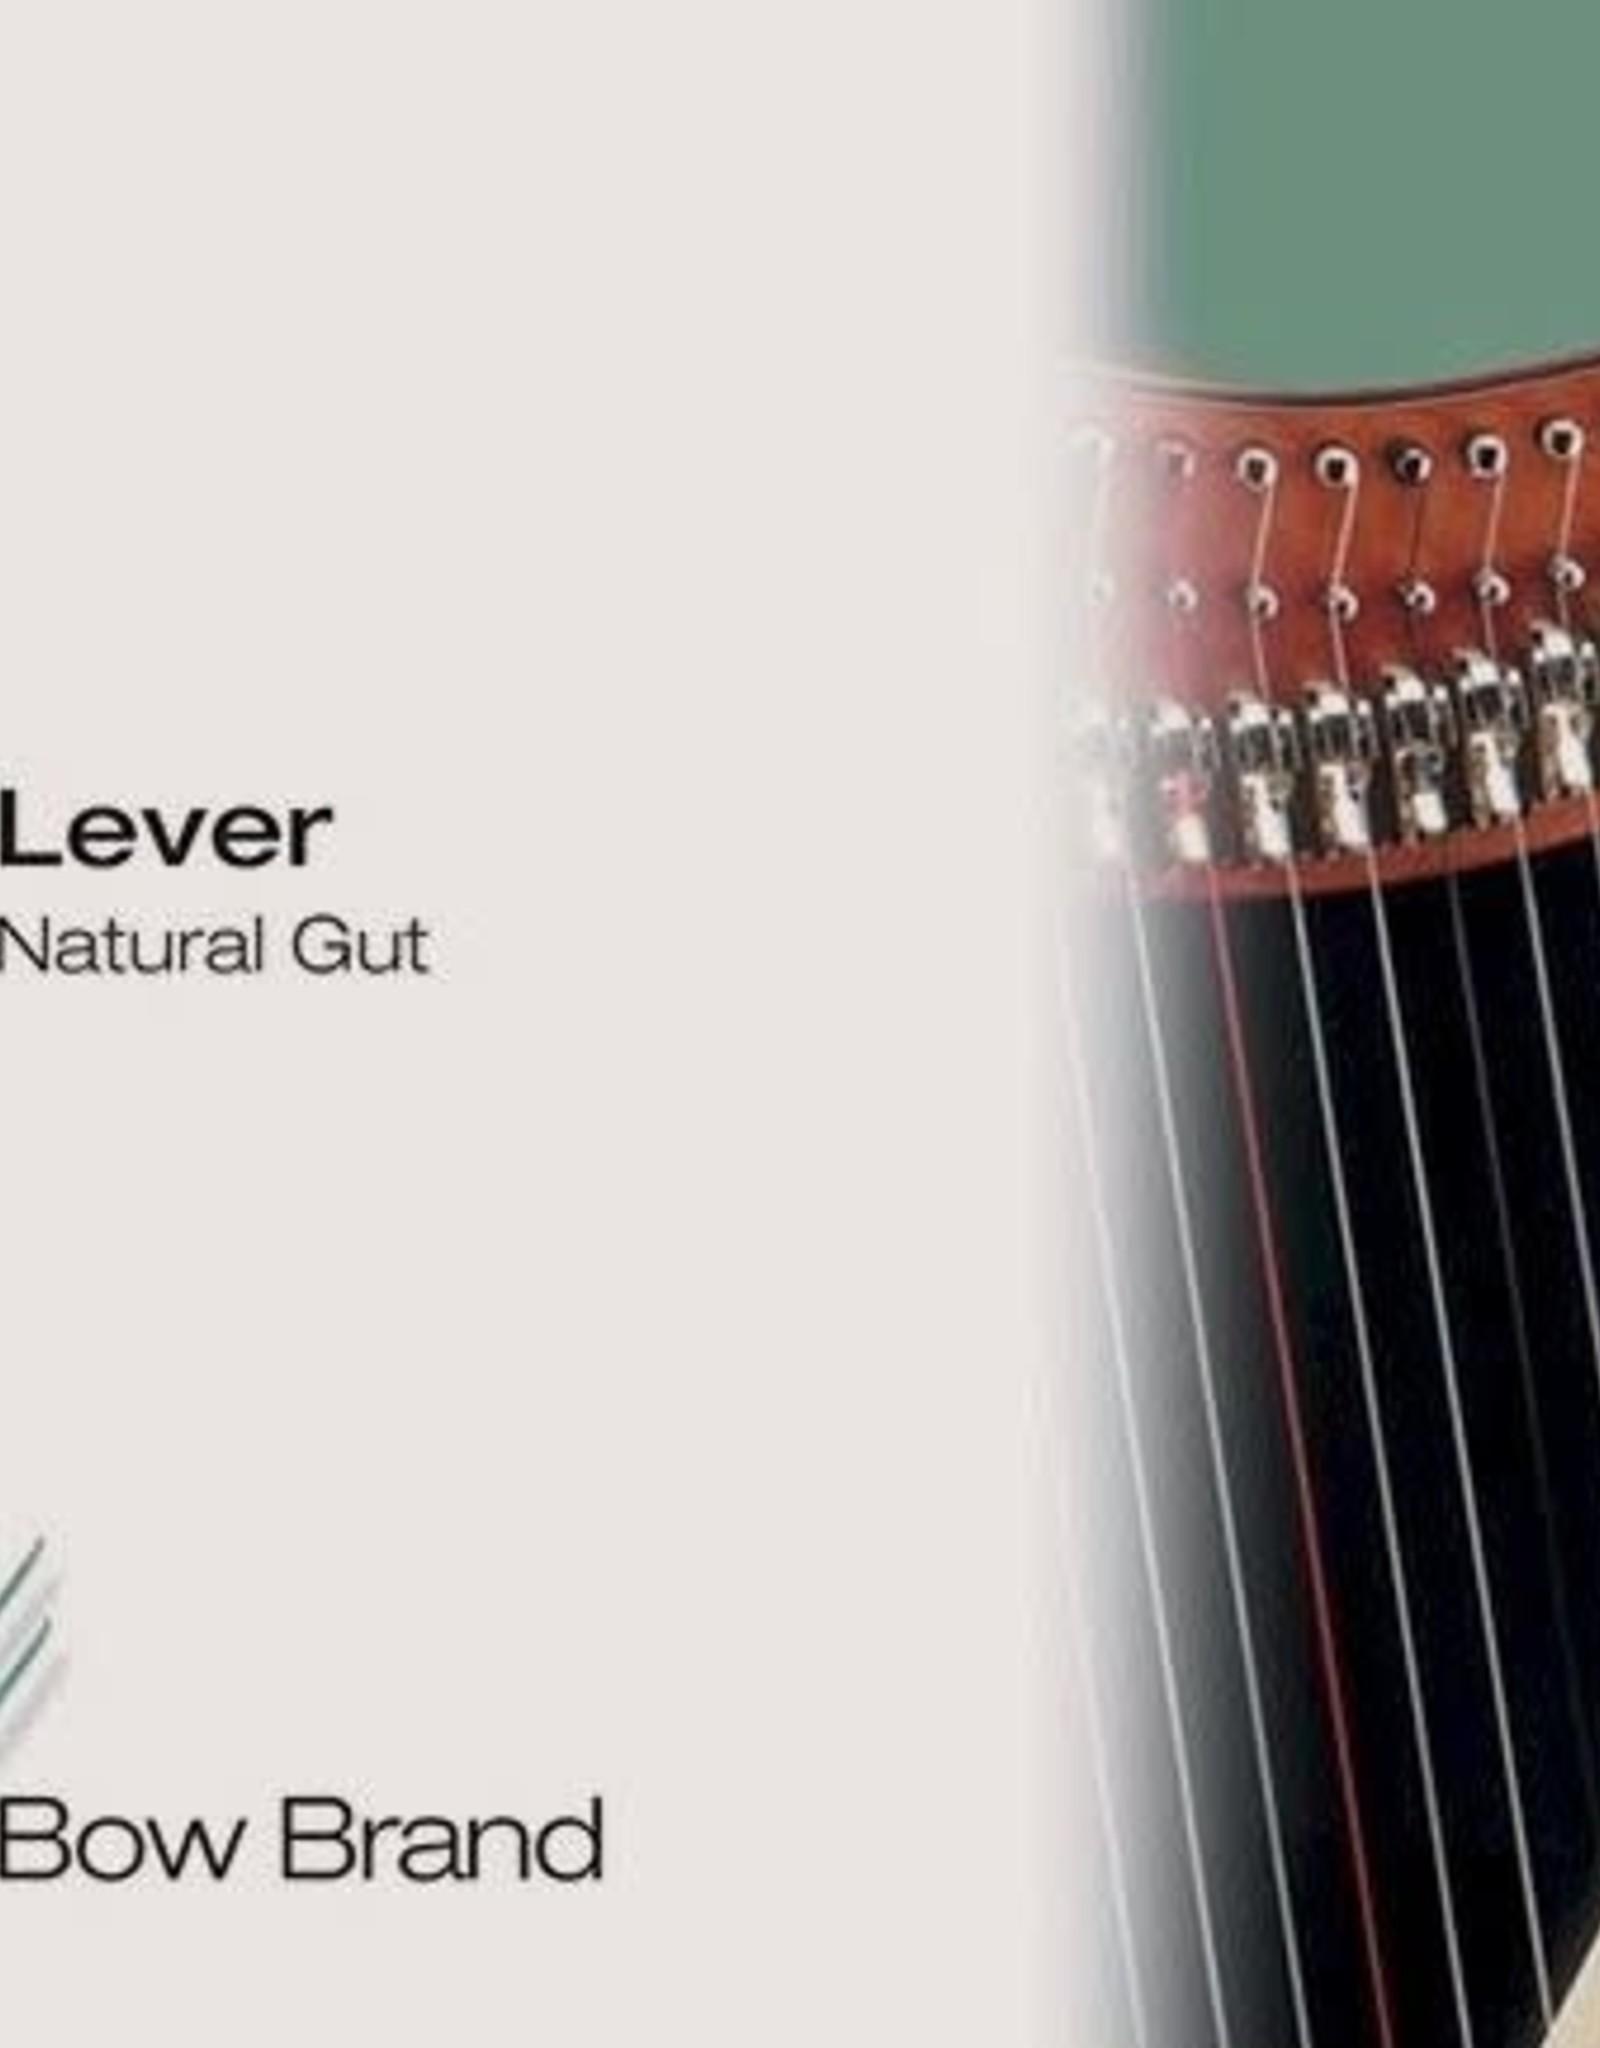 BOW BRAND  klep darm - lever GUT 1/1 mi